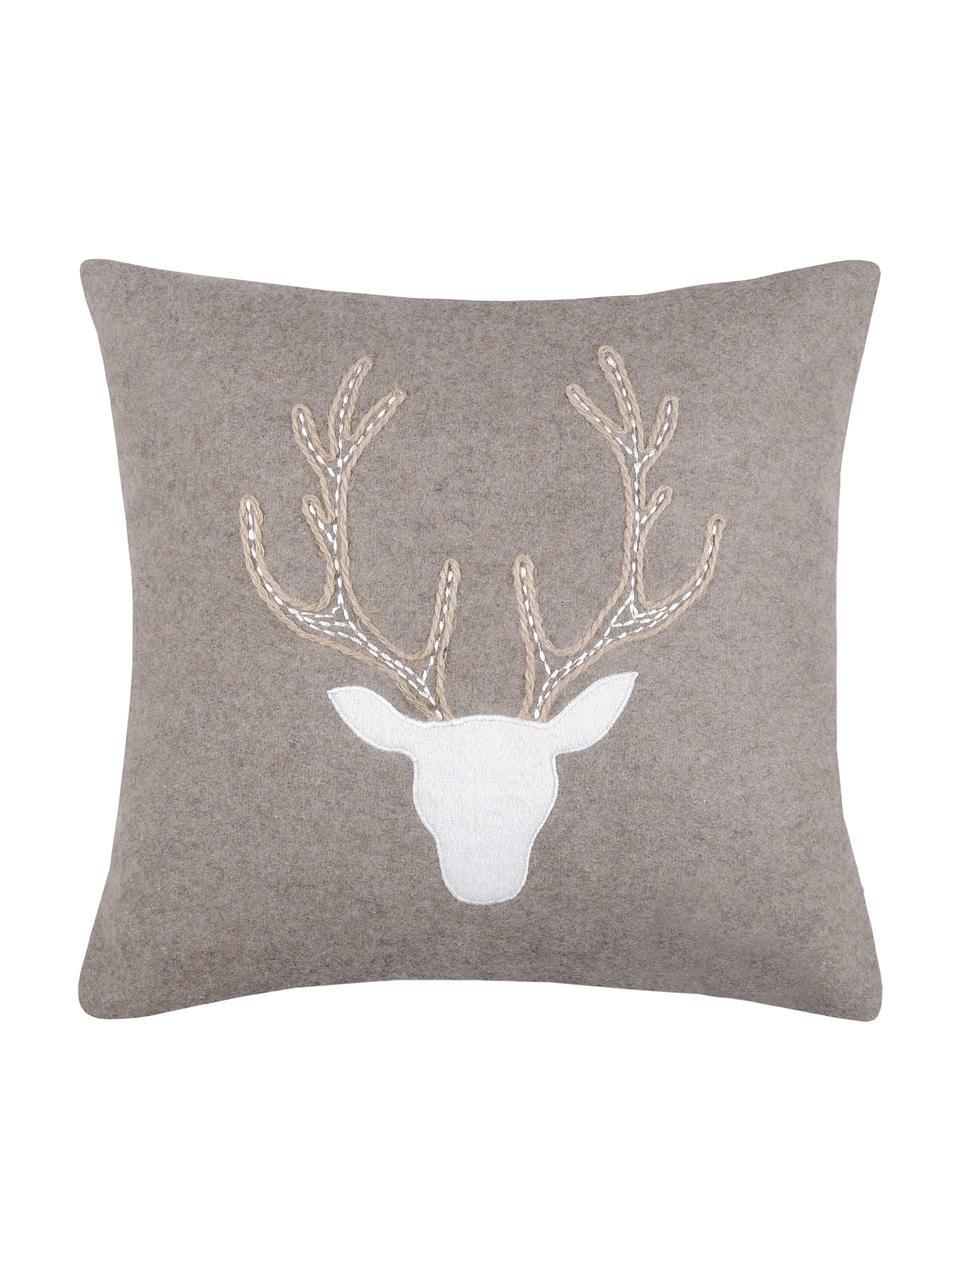 Cuscino con motivo cervo e imbottitura Tamber, Rivestimento: 50% cotone, 32% lana, 7% , Grigio, Larg. 40 x Lung. 40 cm